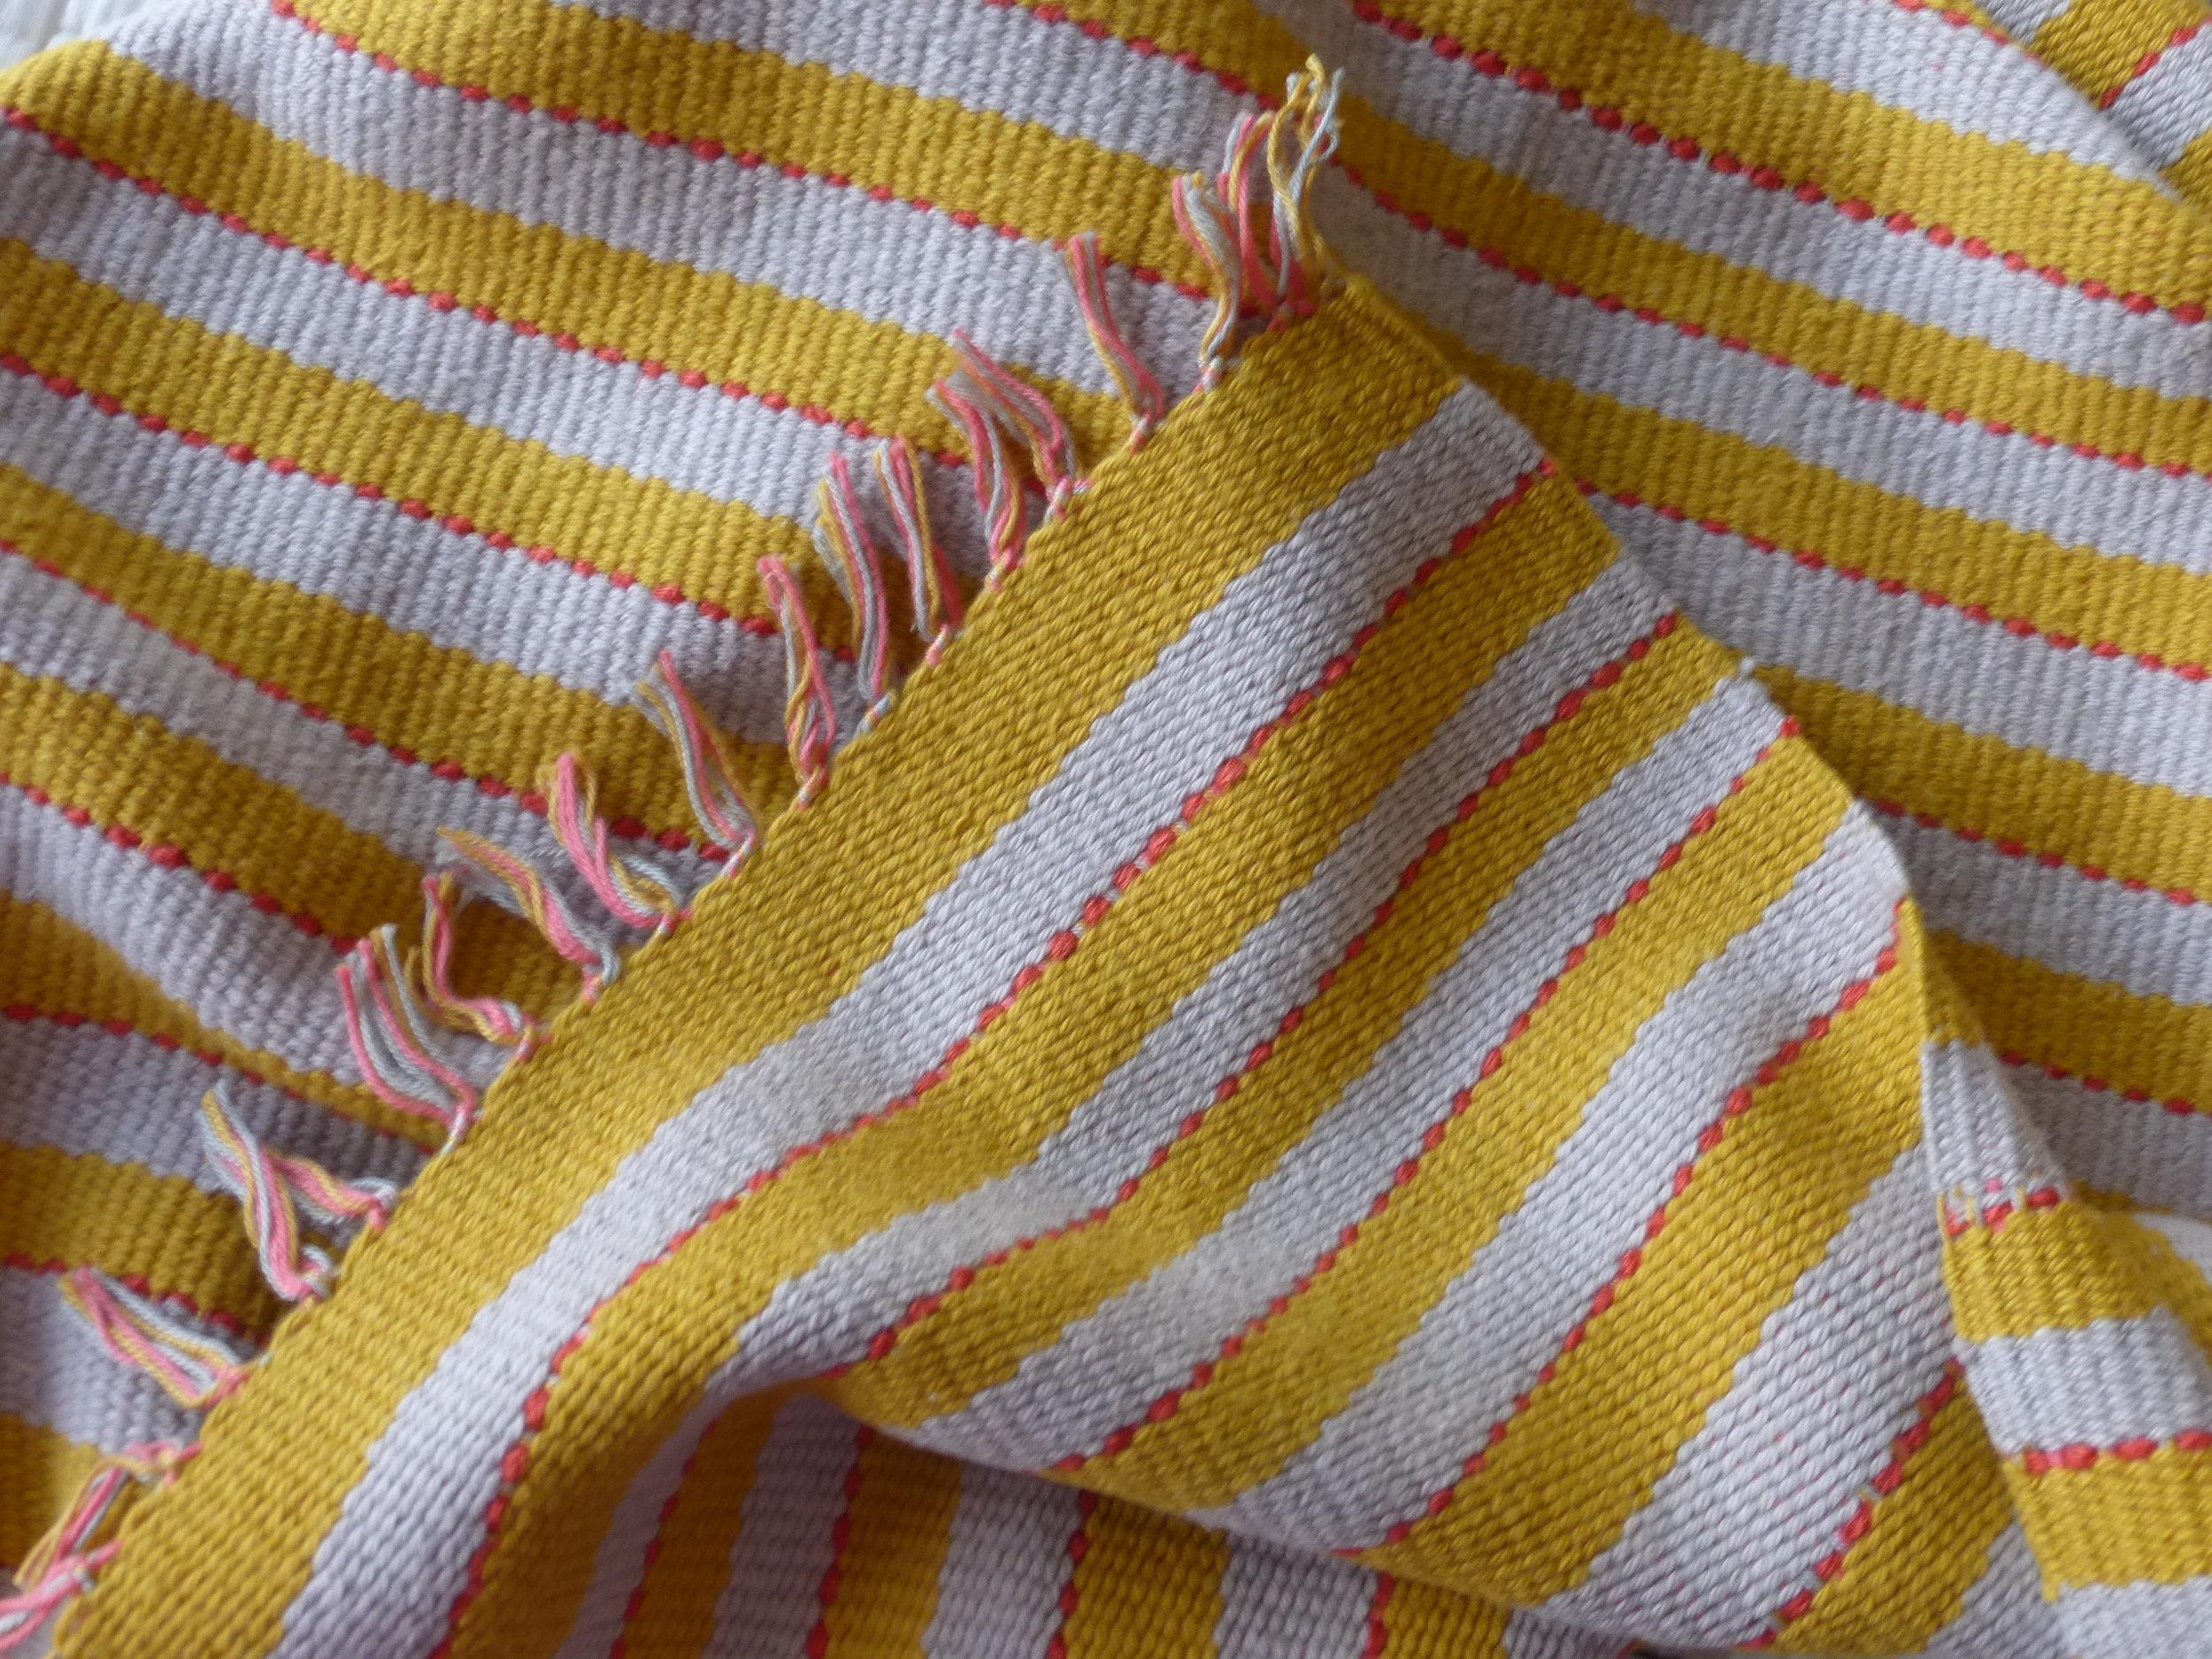 The heavier cotton thread made a thicker, less drapey cloth.